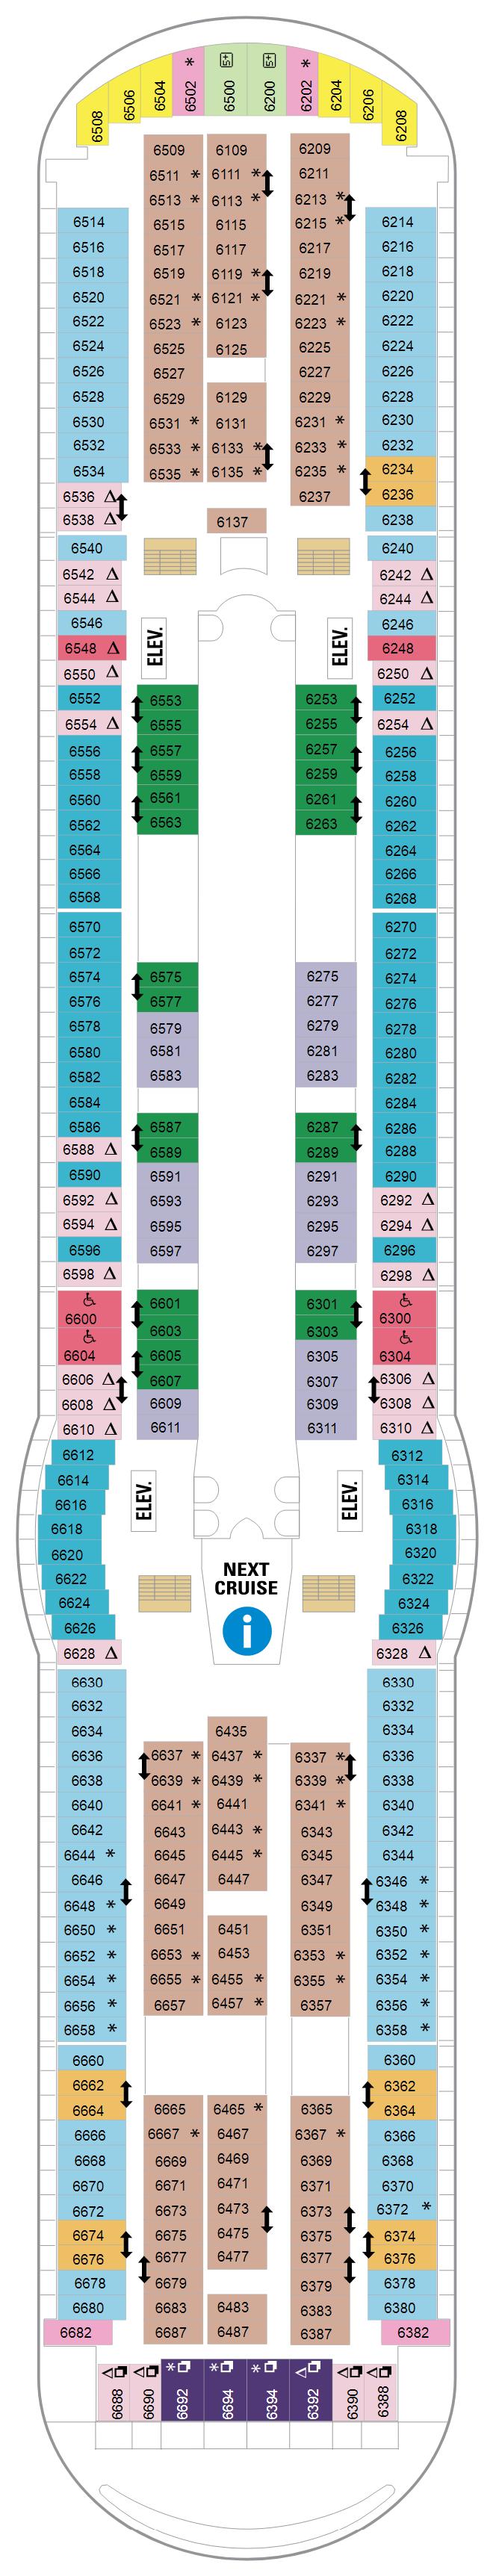 Deck 6 (April 21st, 2021 - April 30th, 2022)